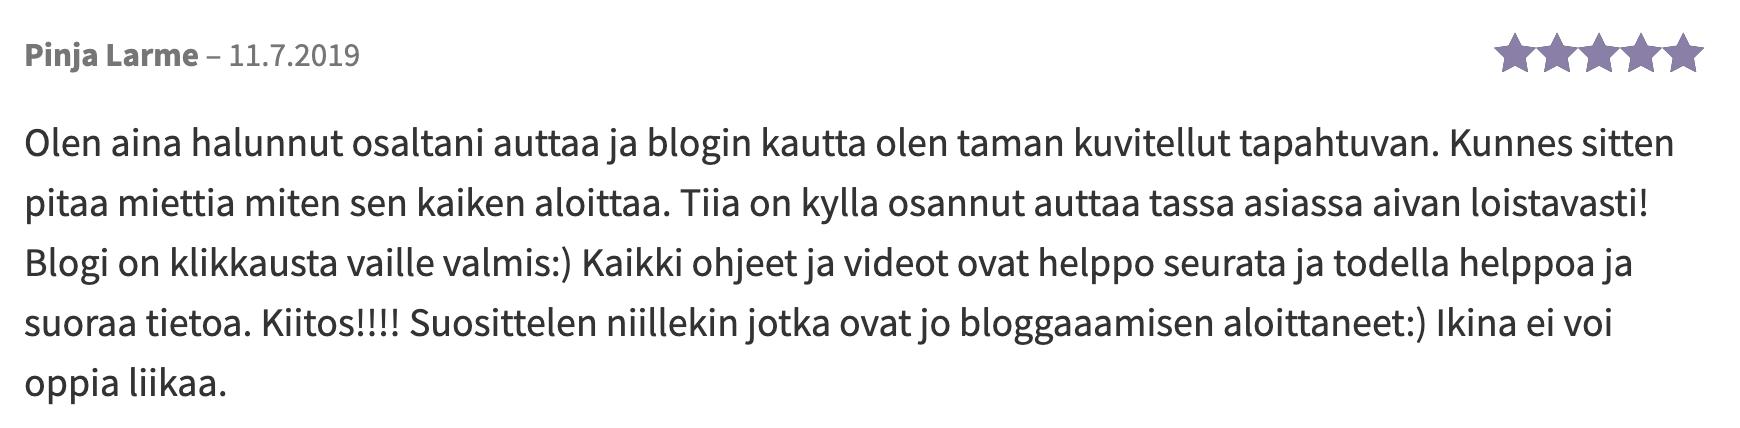 palaute_pinja